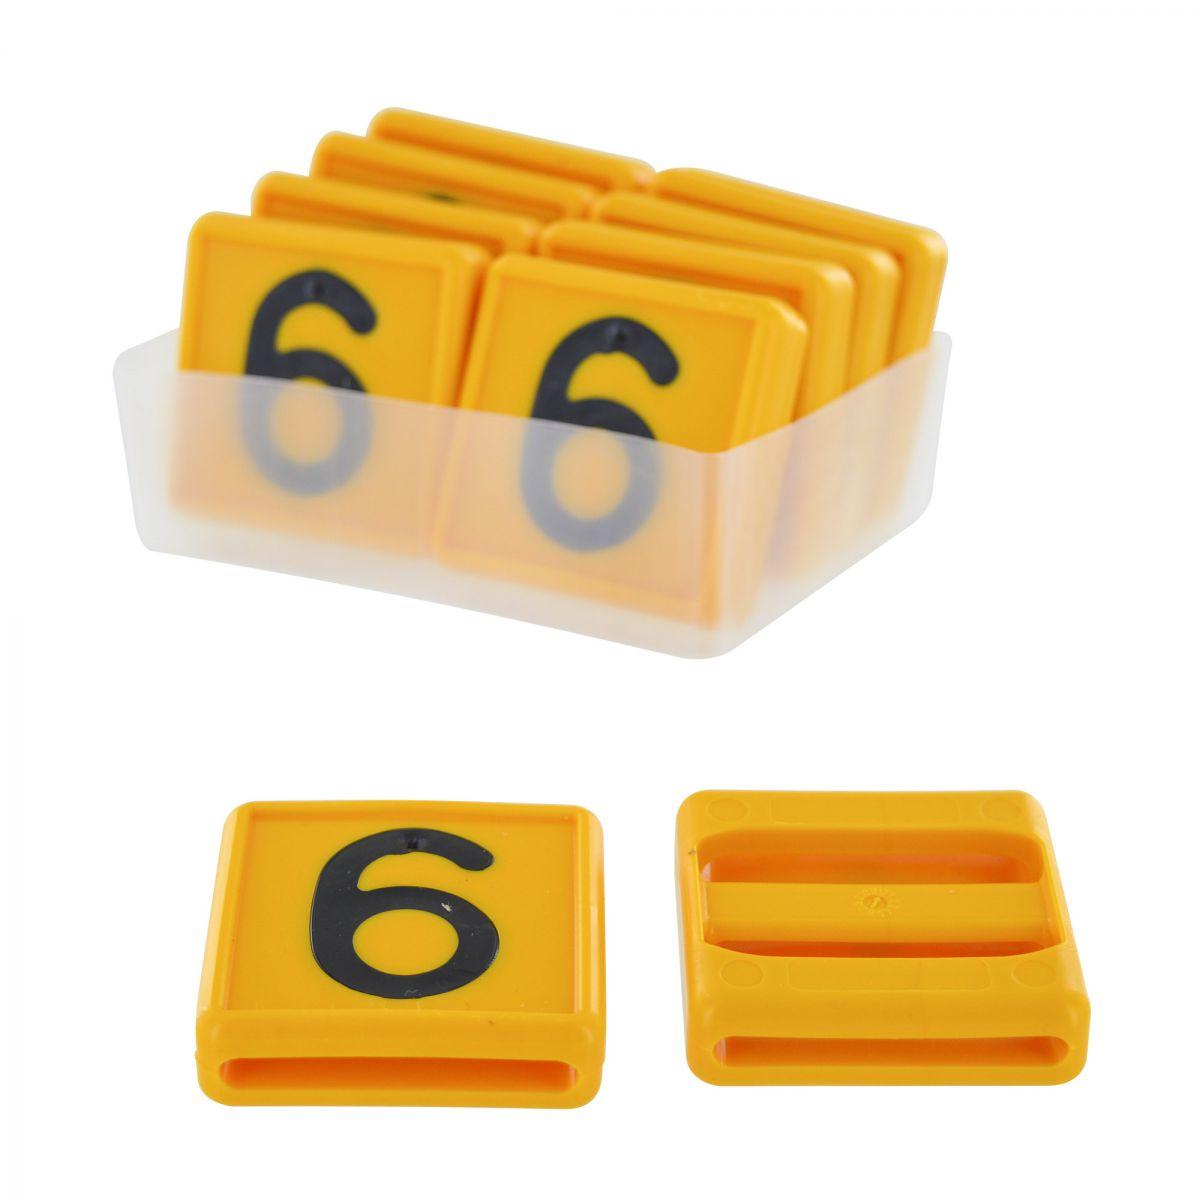 nummer 69 fr kuhhalsband 10 stck im karton gelb 48x46mm